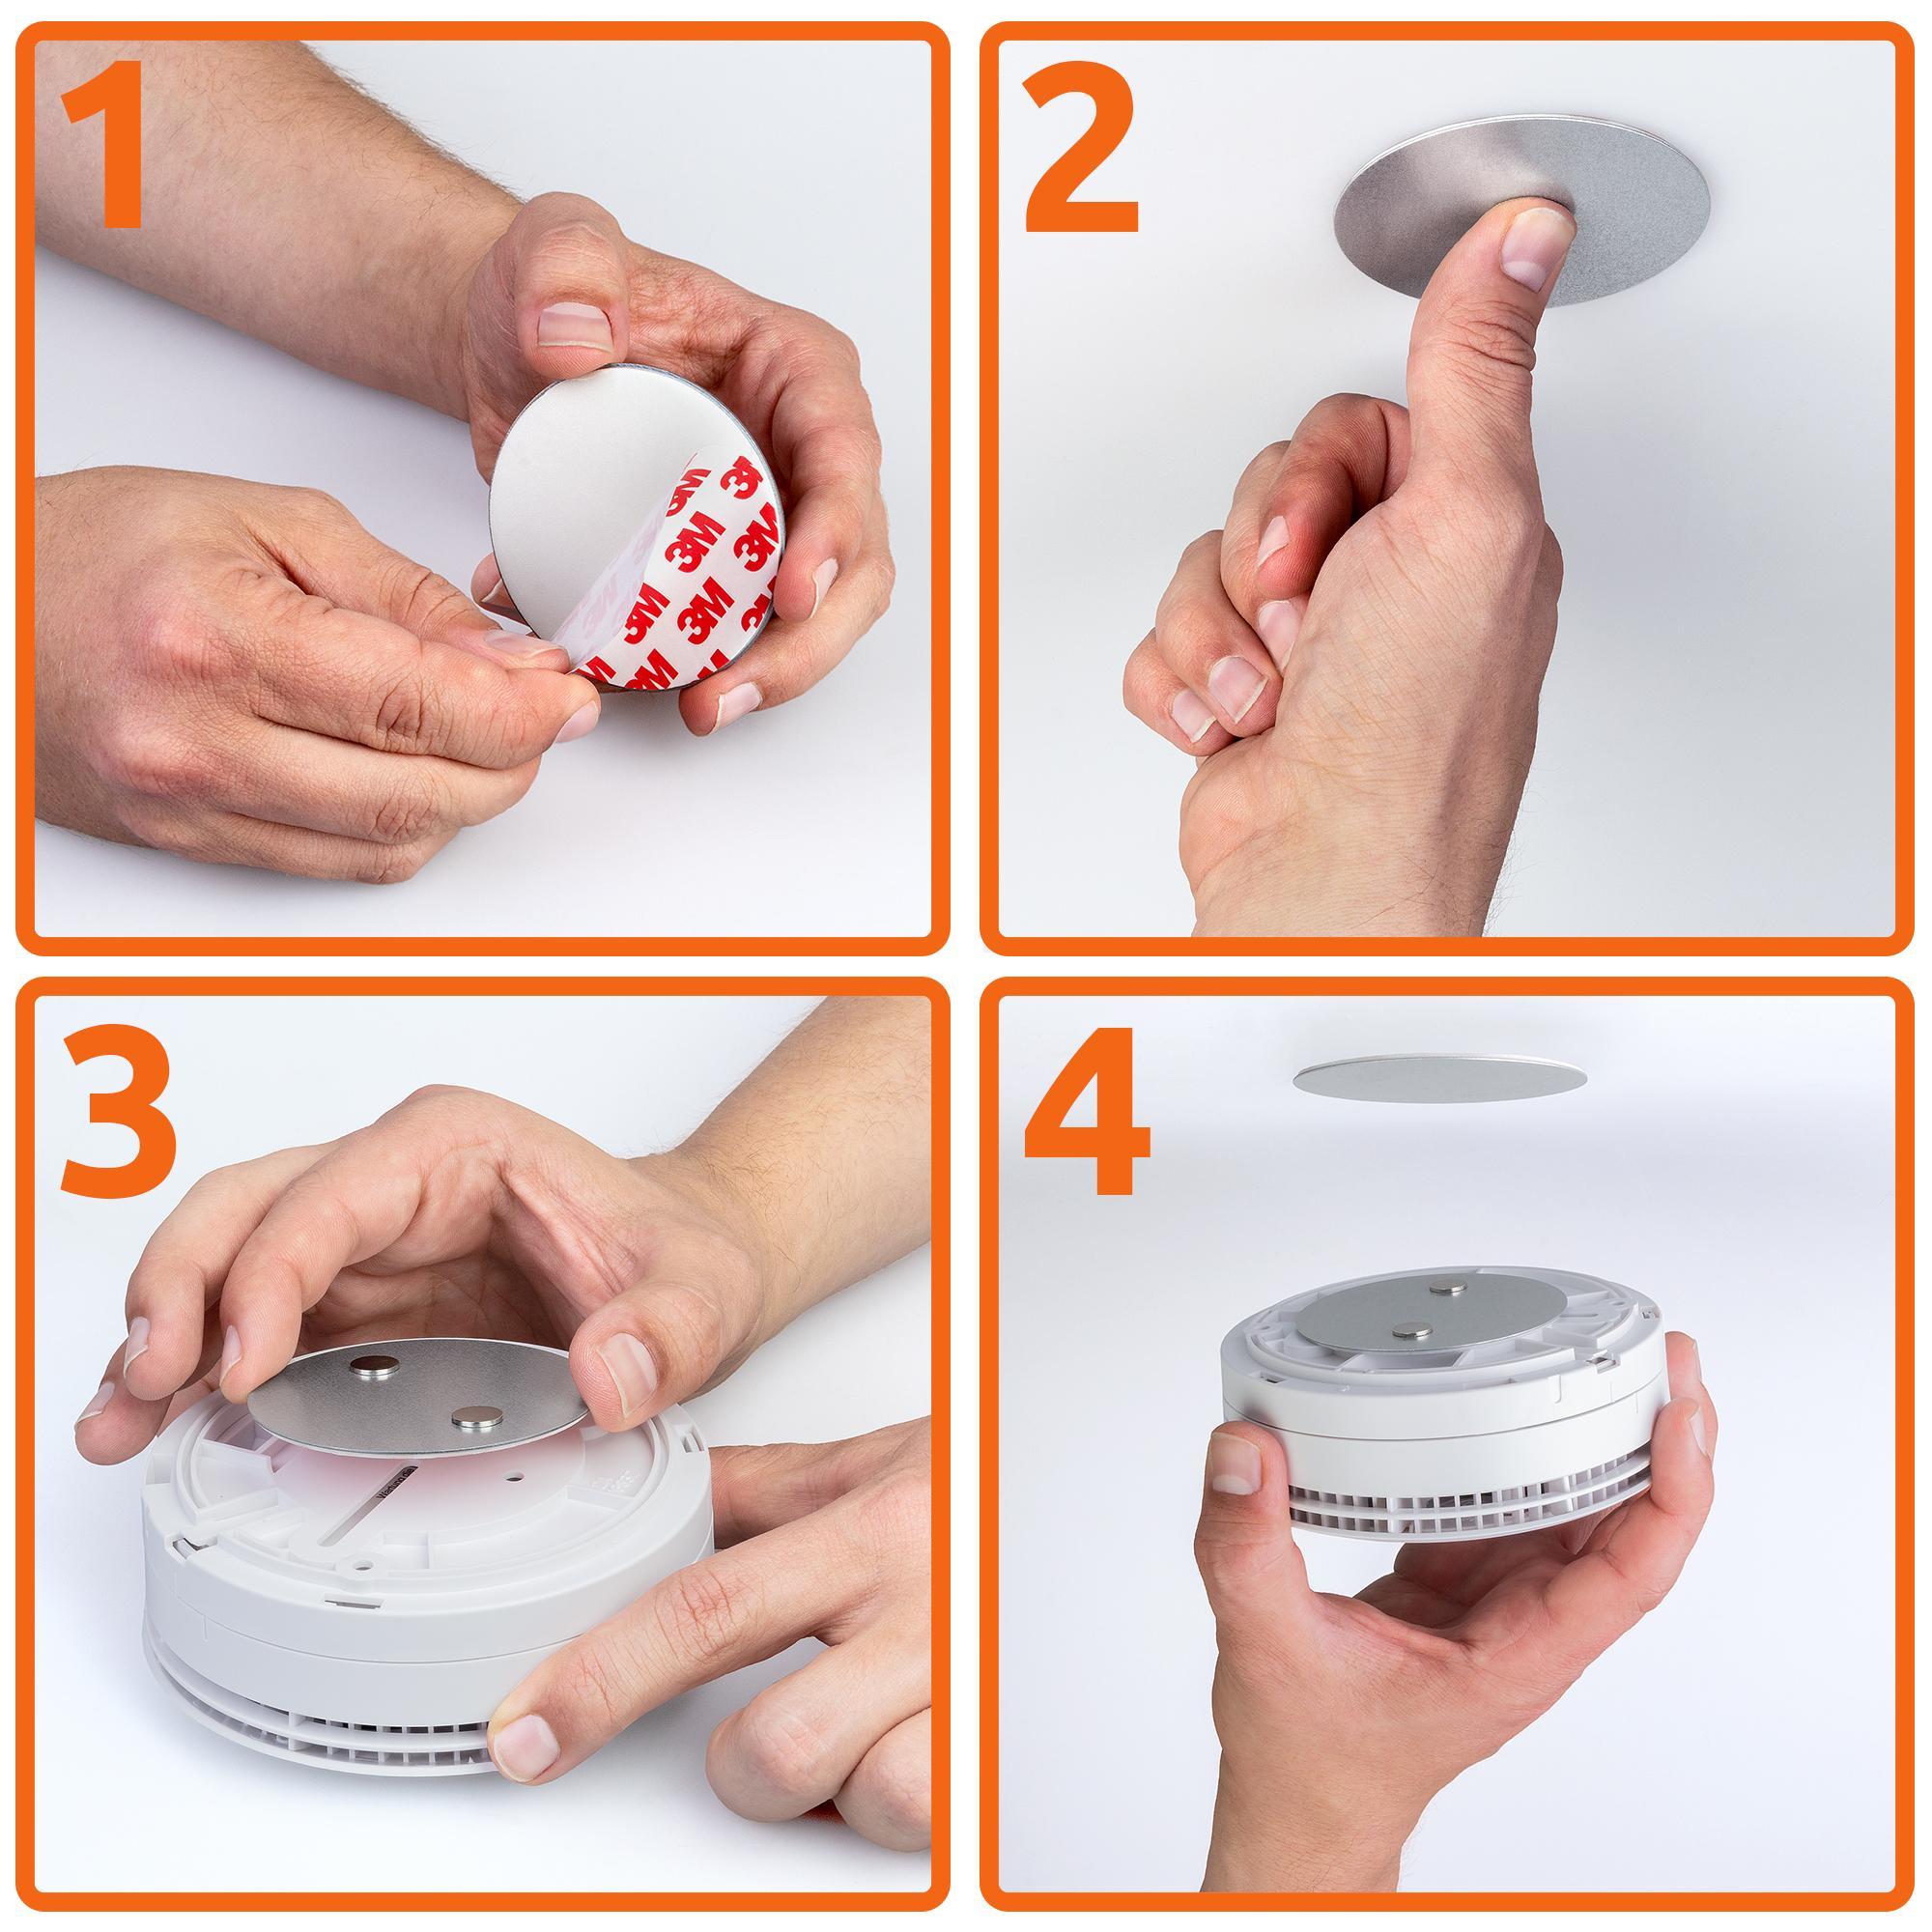 5x rauchmelder befestigung magnet halter ung magnethalter ung magnet pad 70mm ebay. Black Bedroom Furniture Sets. Home Design Ideas